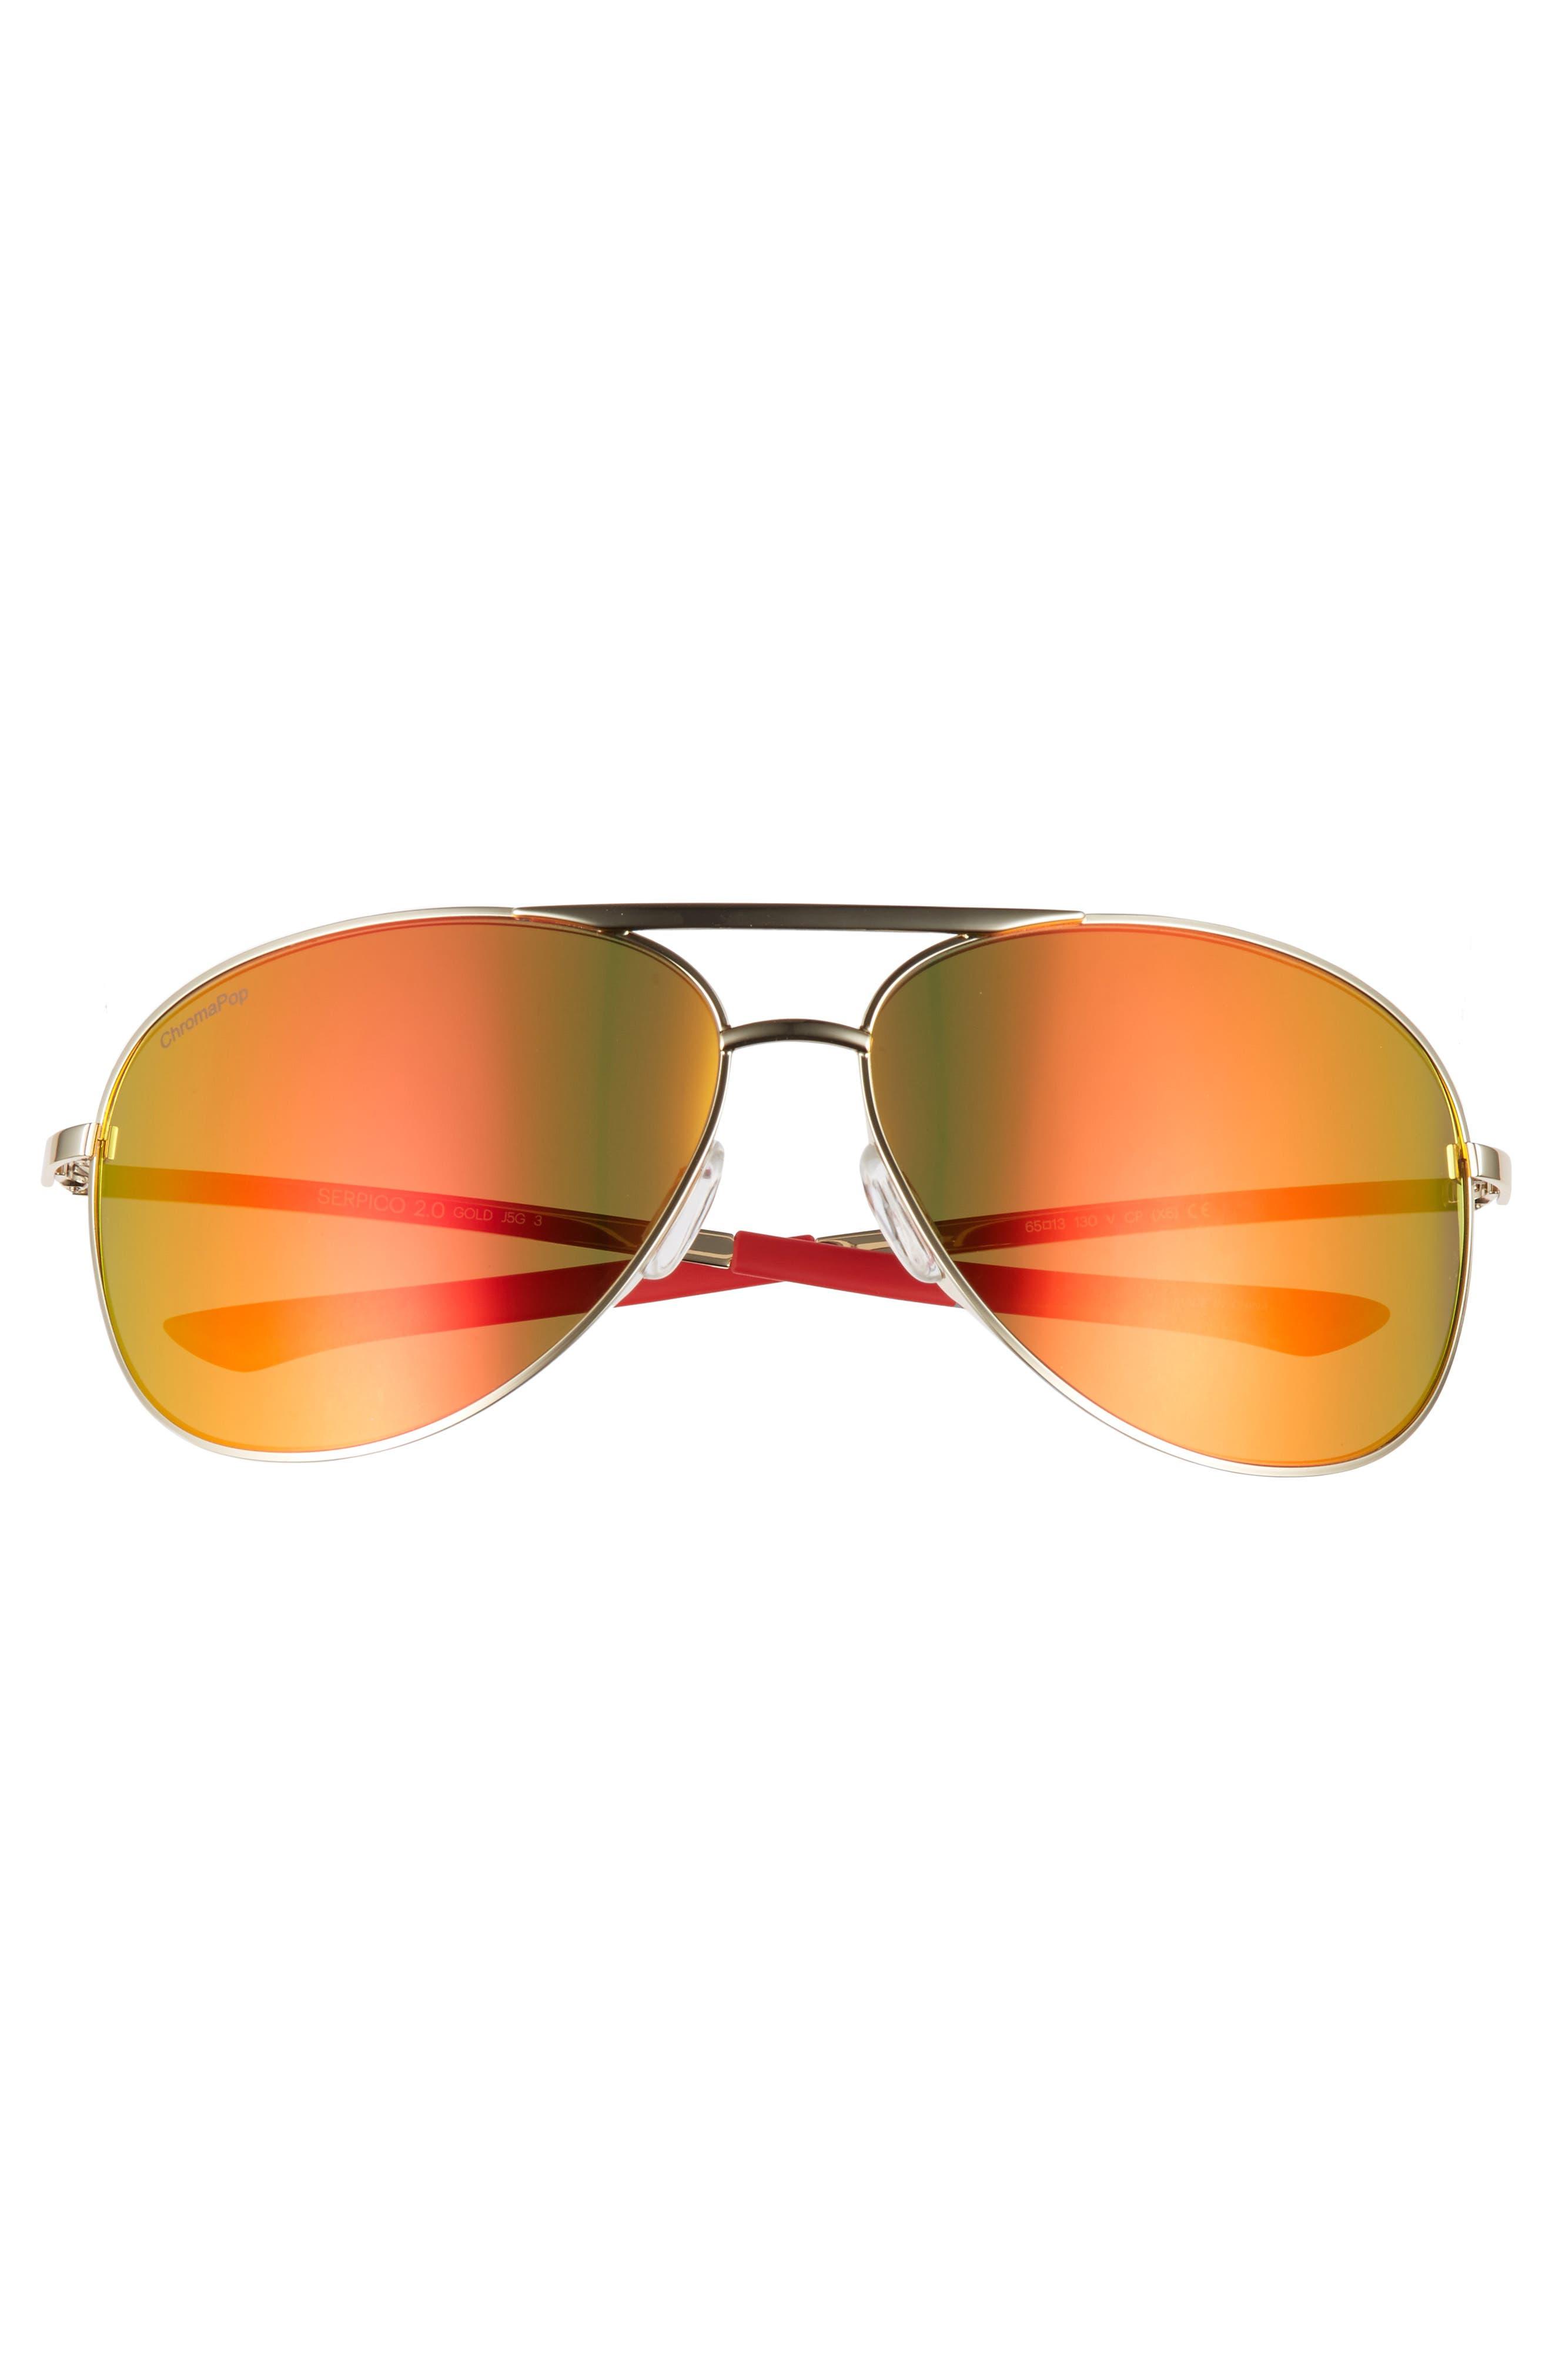 Alternate Image 3  - Smith Serpico 2 65mm Mirrored ChromaPop™ Polarized Aviator Sunglasses